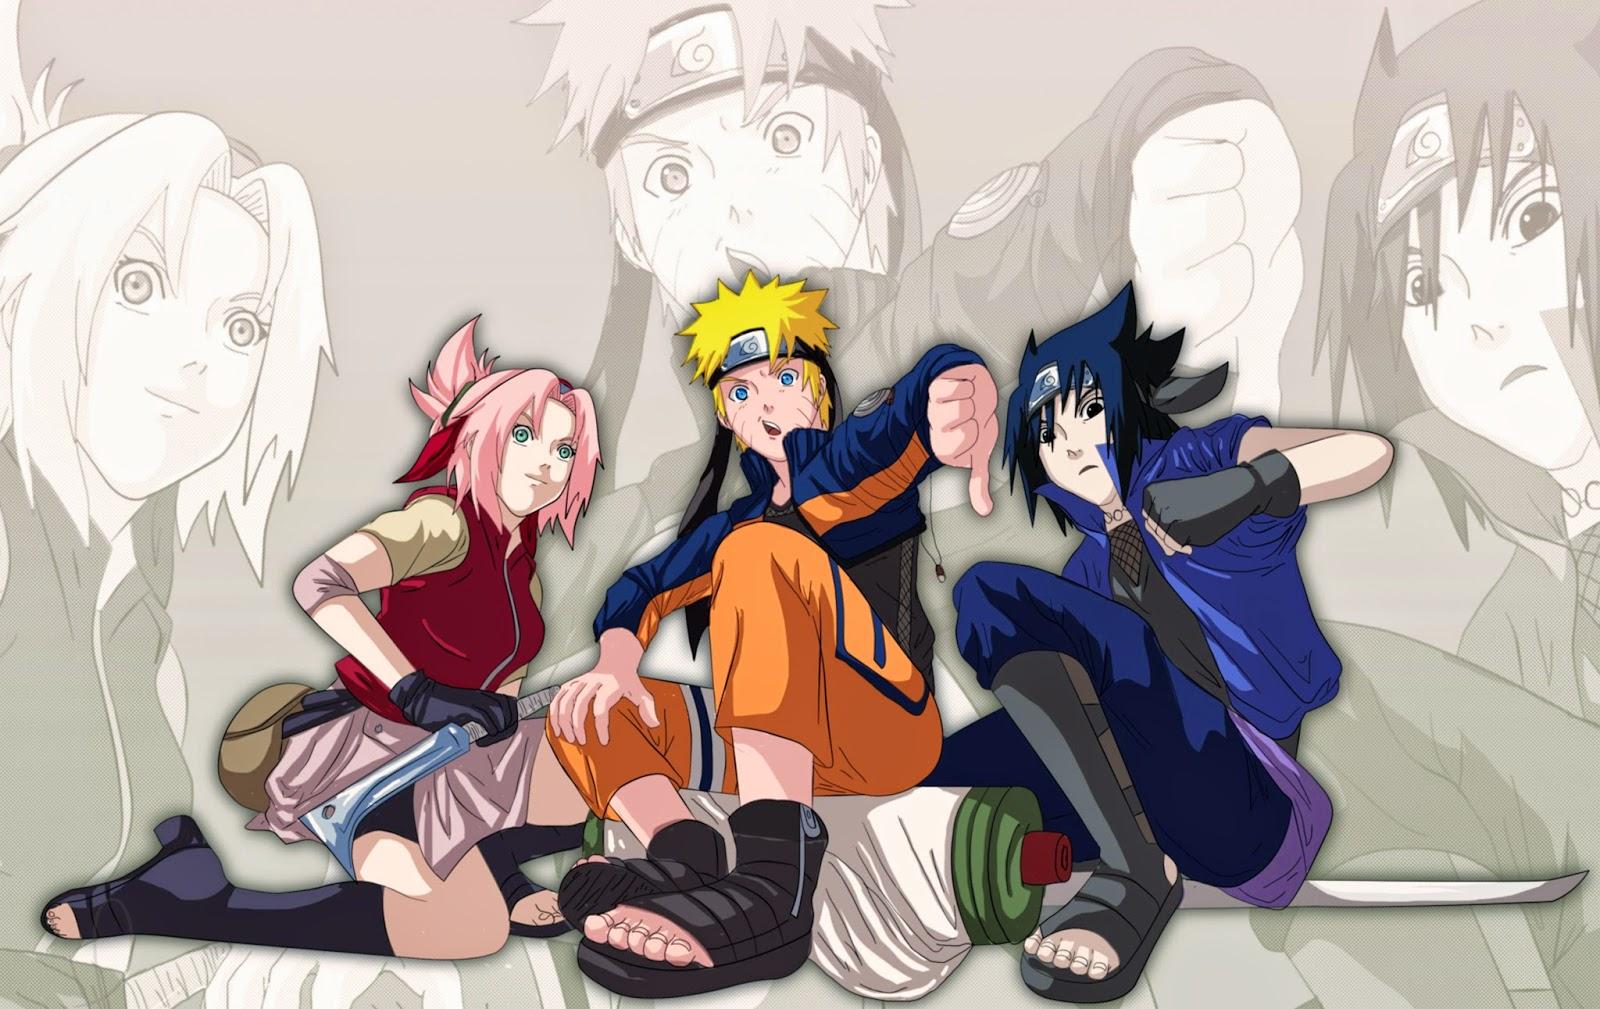 Gambar Naruto VS Sasuke - Kumpulan Gambar Terbaru